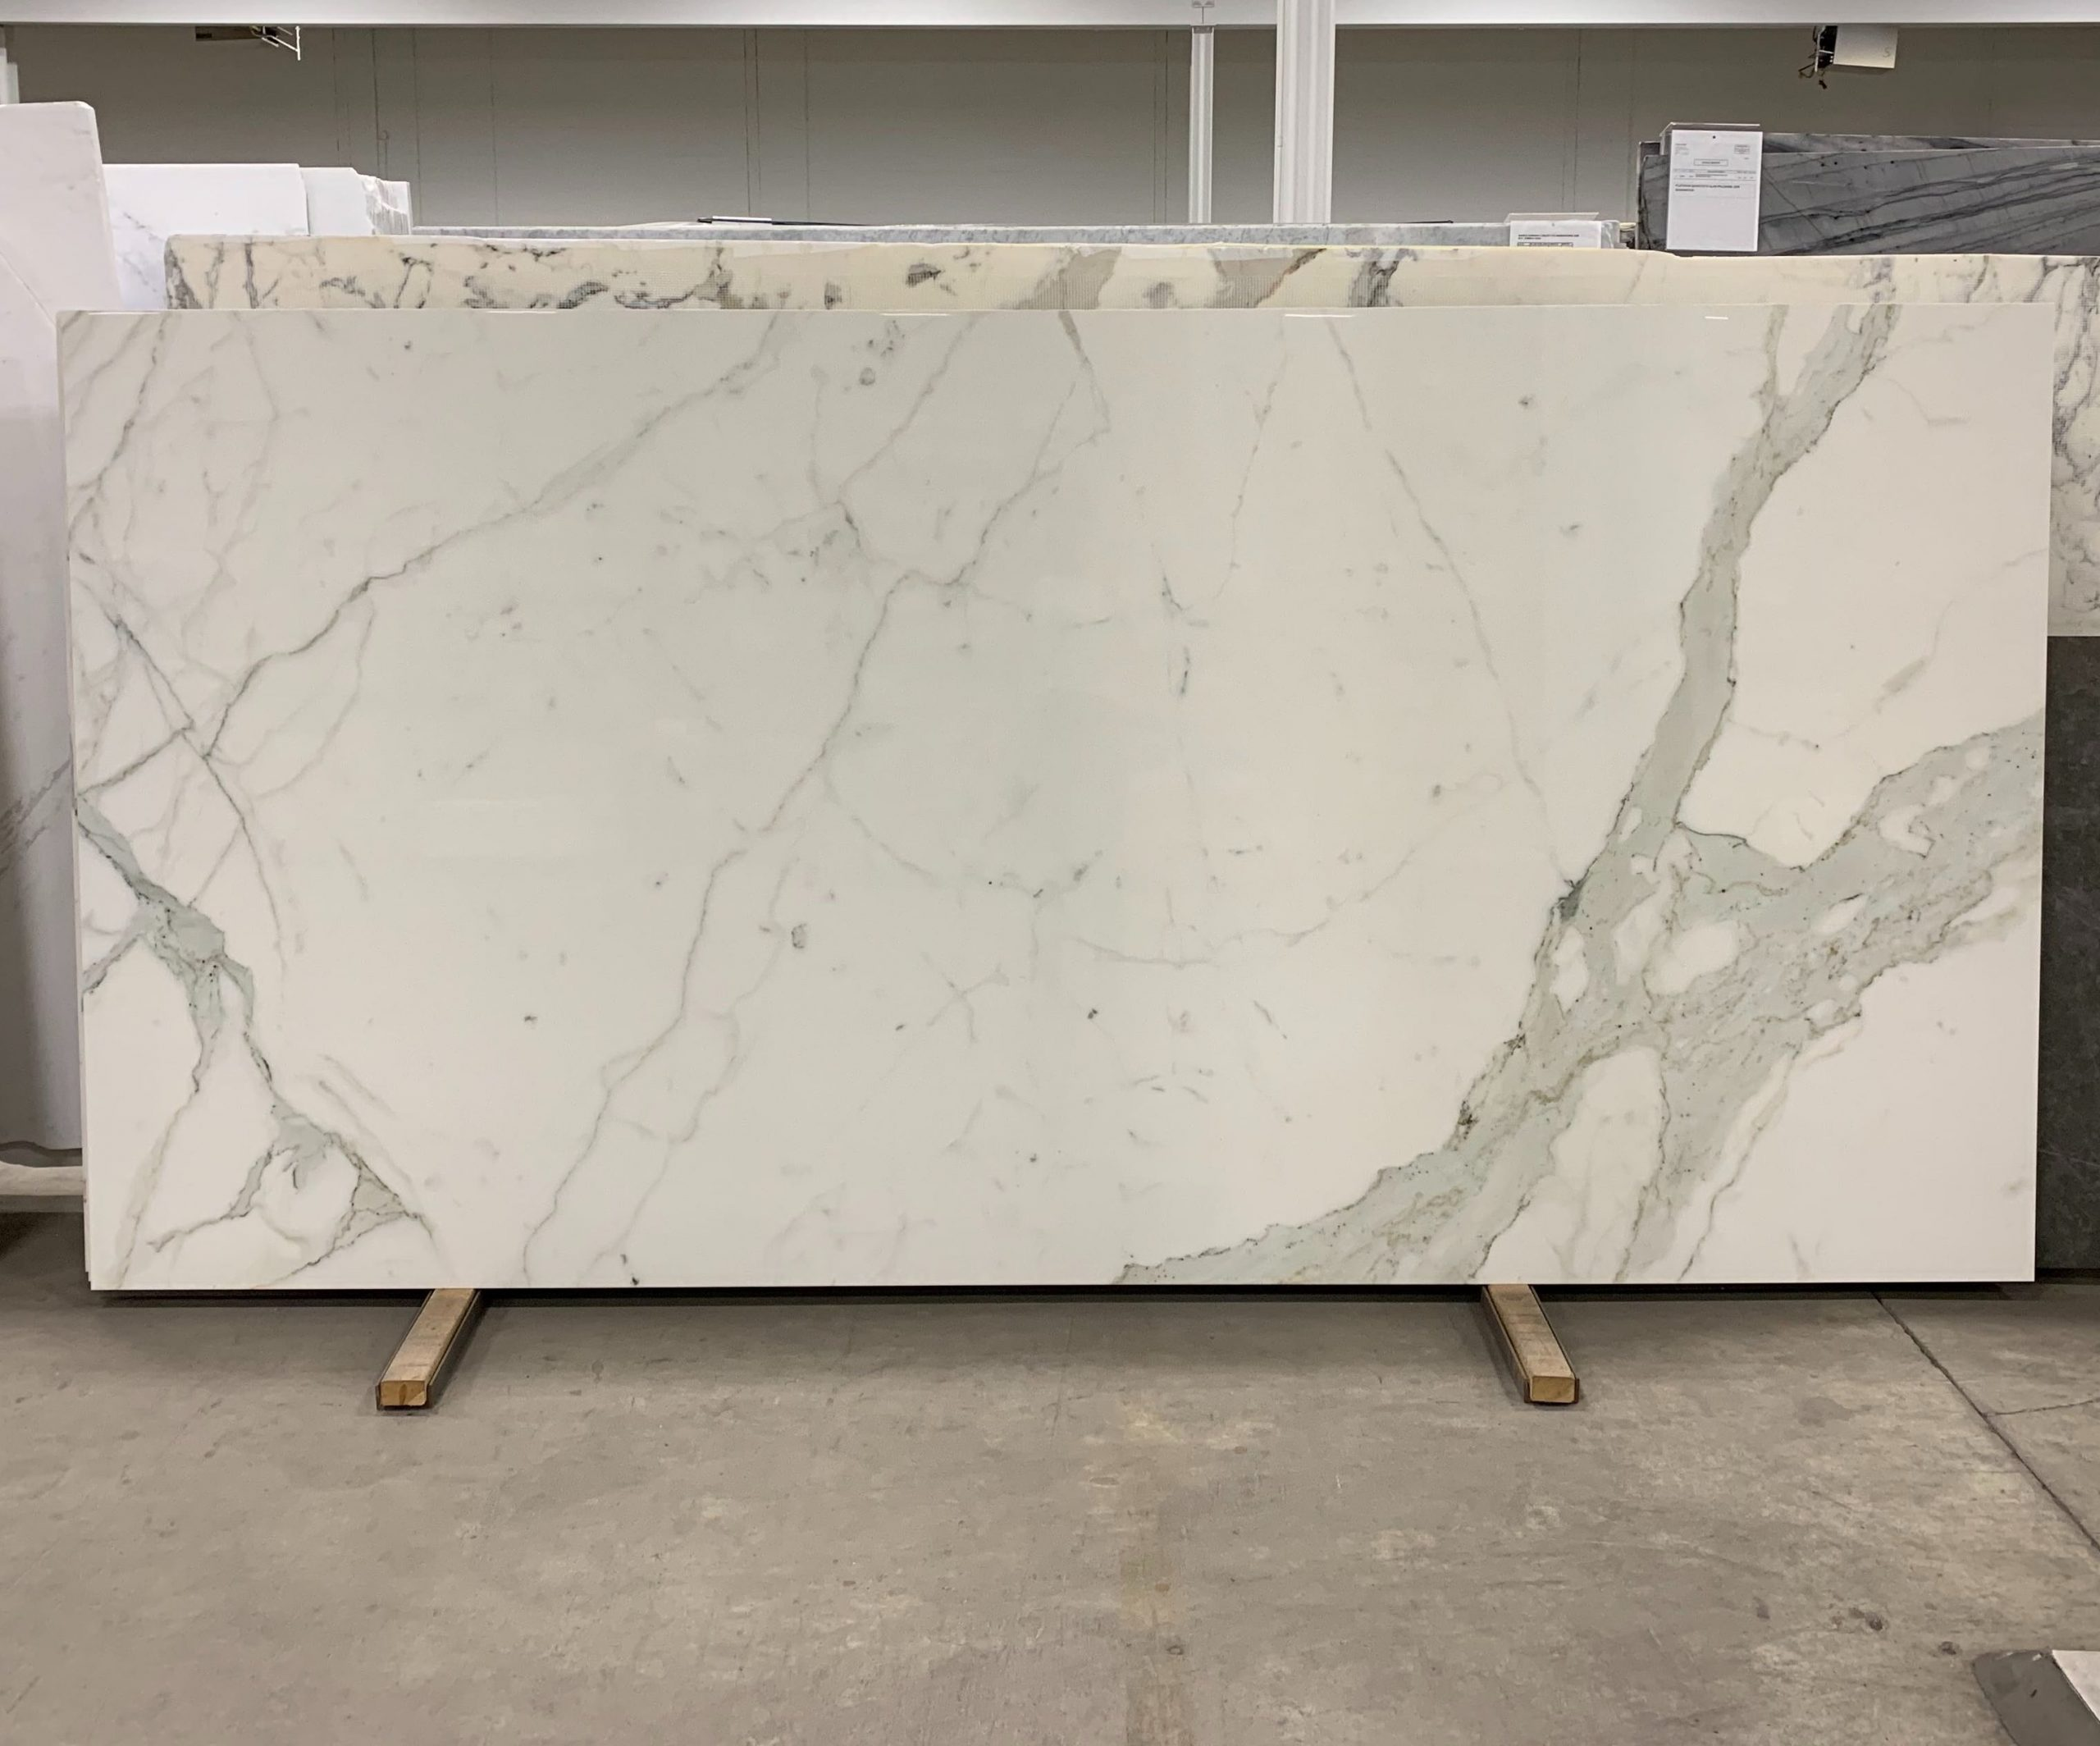 Porcelano Calacatta Oro Slab Marble Trend Marble